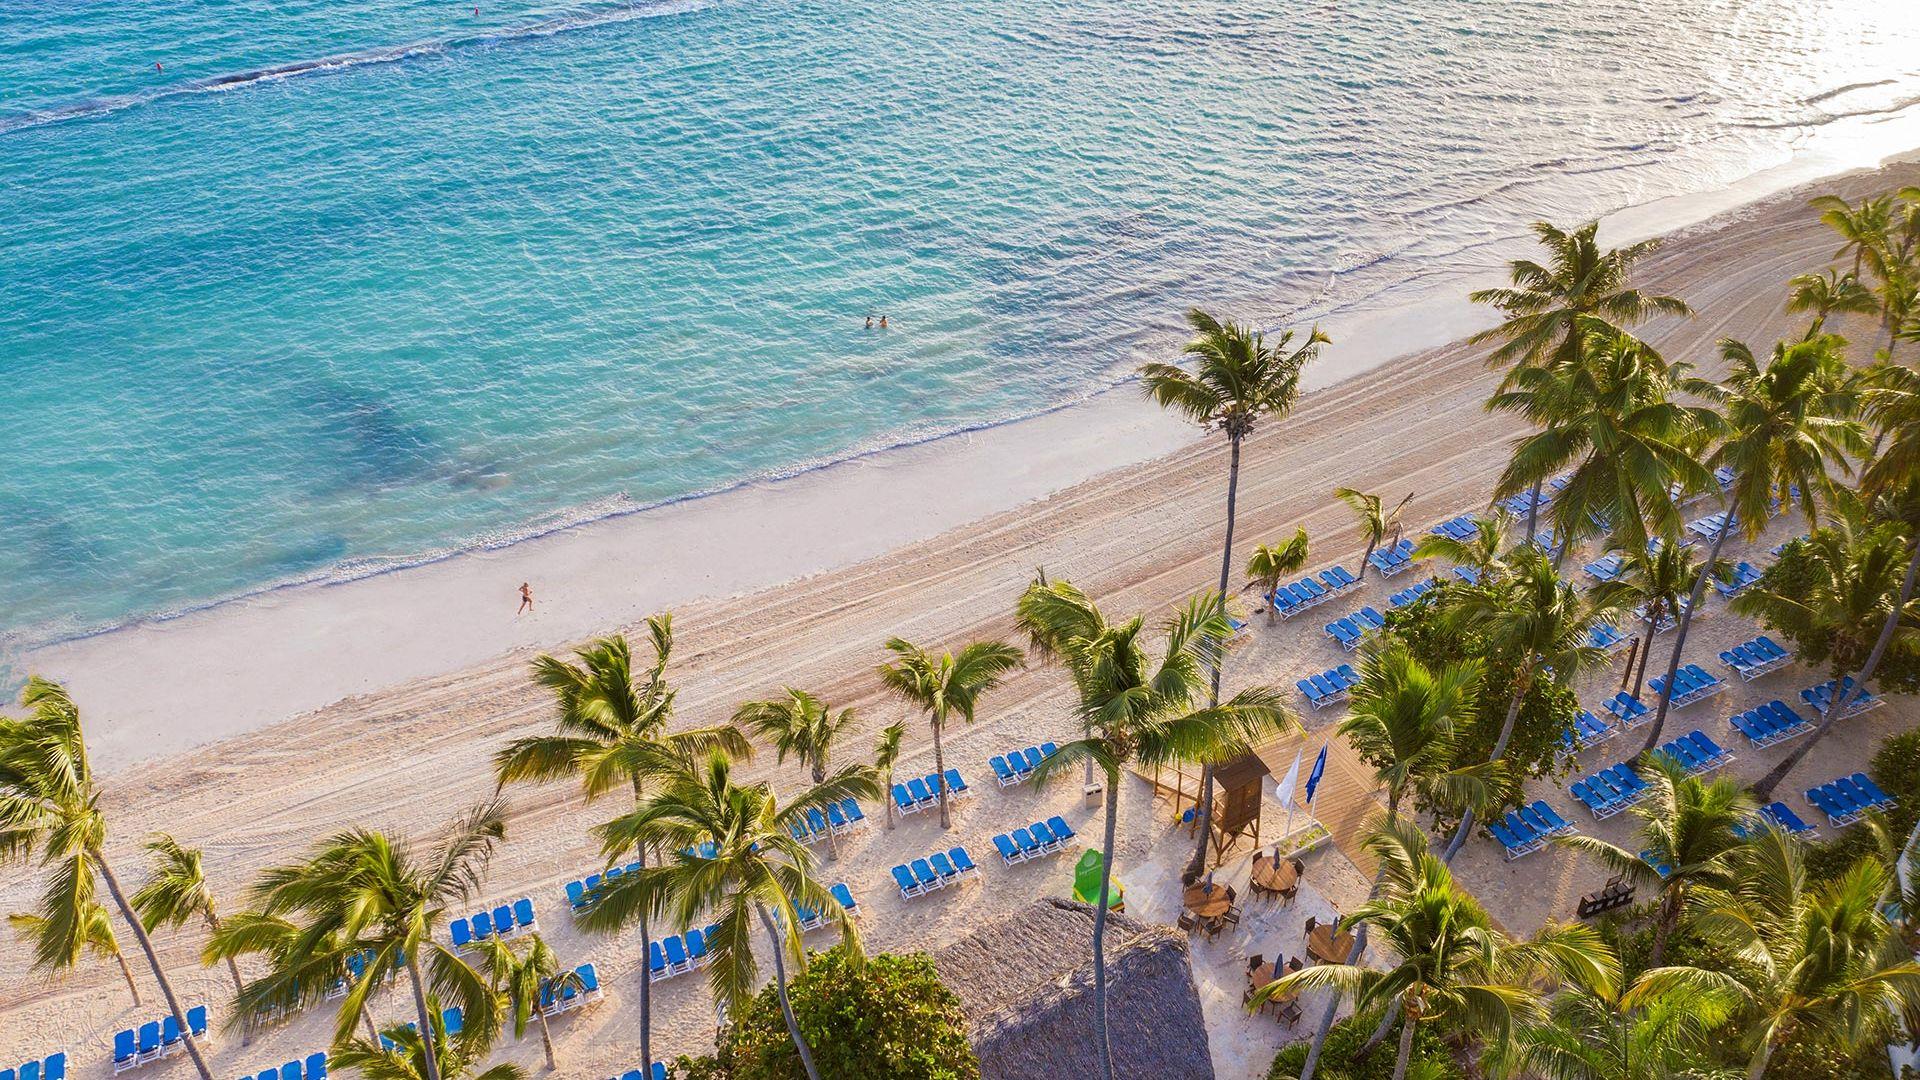 Sejur charter Impressive Resort Punta Cana, 9 zile - ianuarie 2022